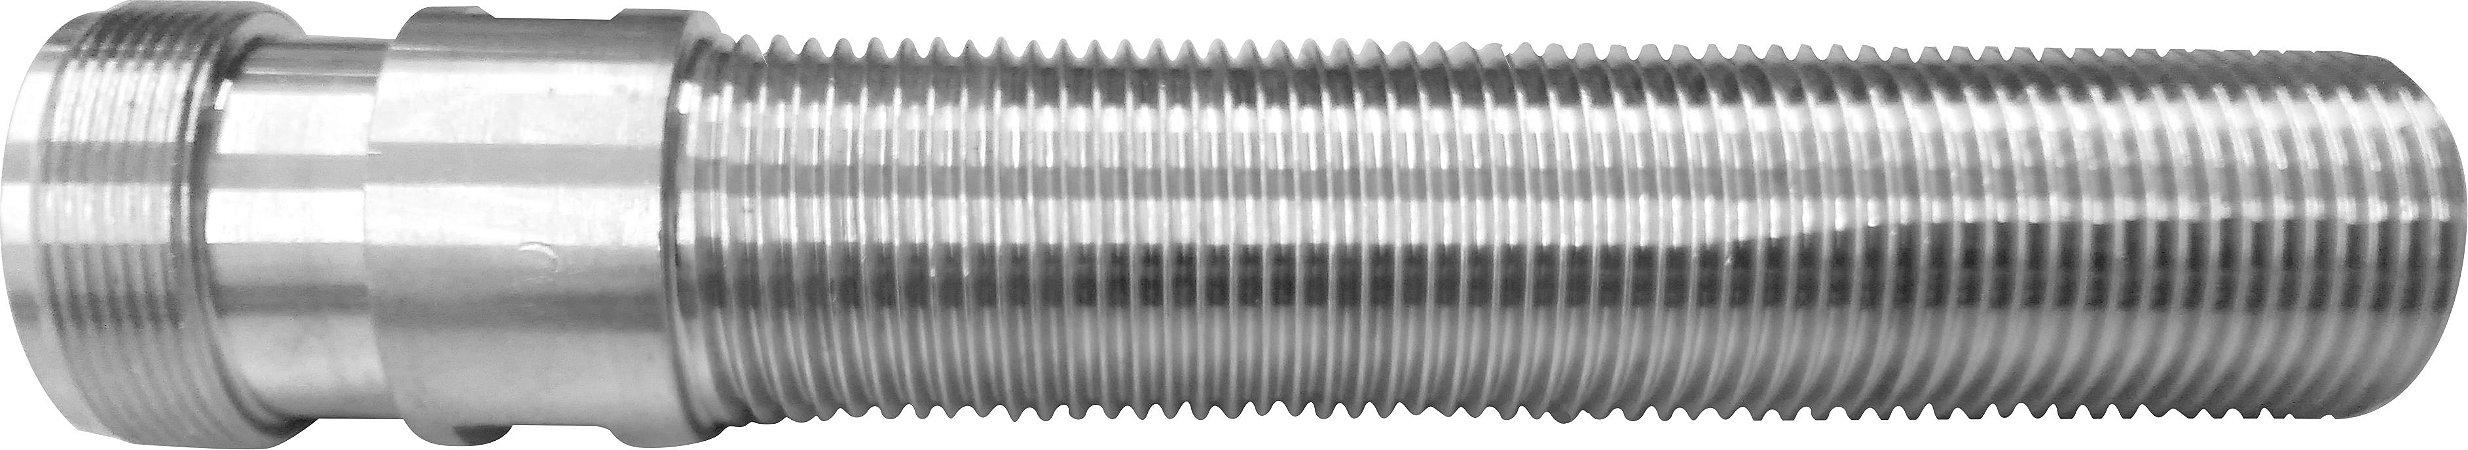 Shank/rosca 100mm inox p/ torneiras de chope tipo belga